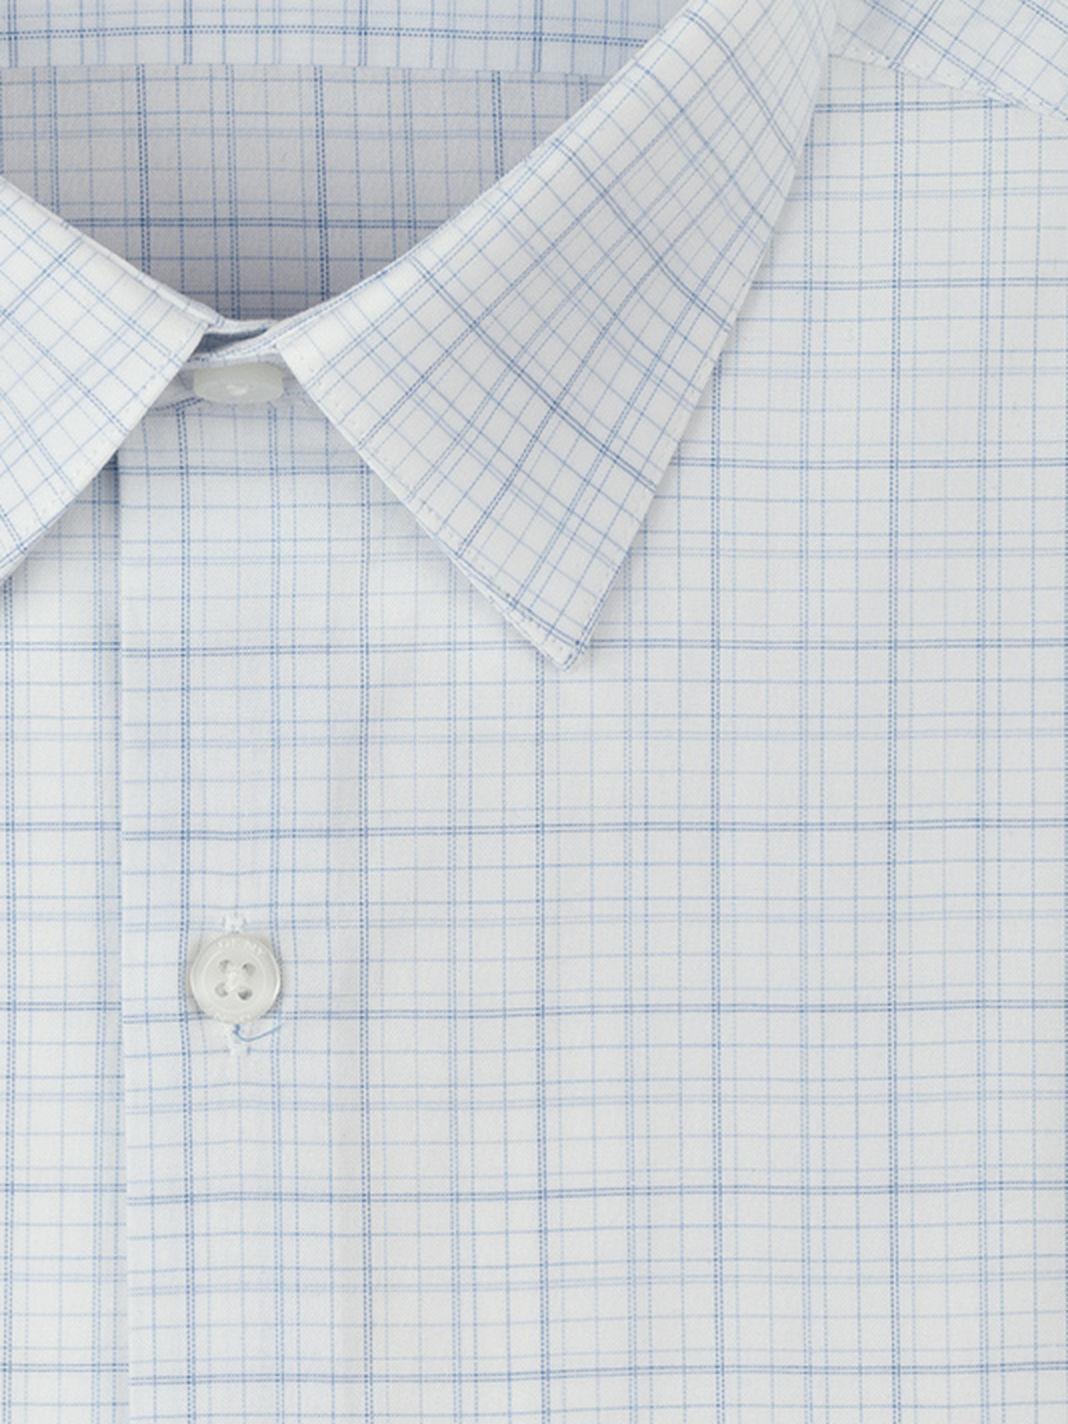 Dkny white grid plaid dress shirt in blue for men soft for Blue white dress shirt